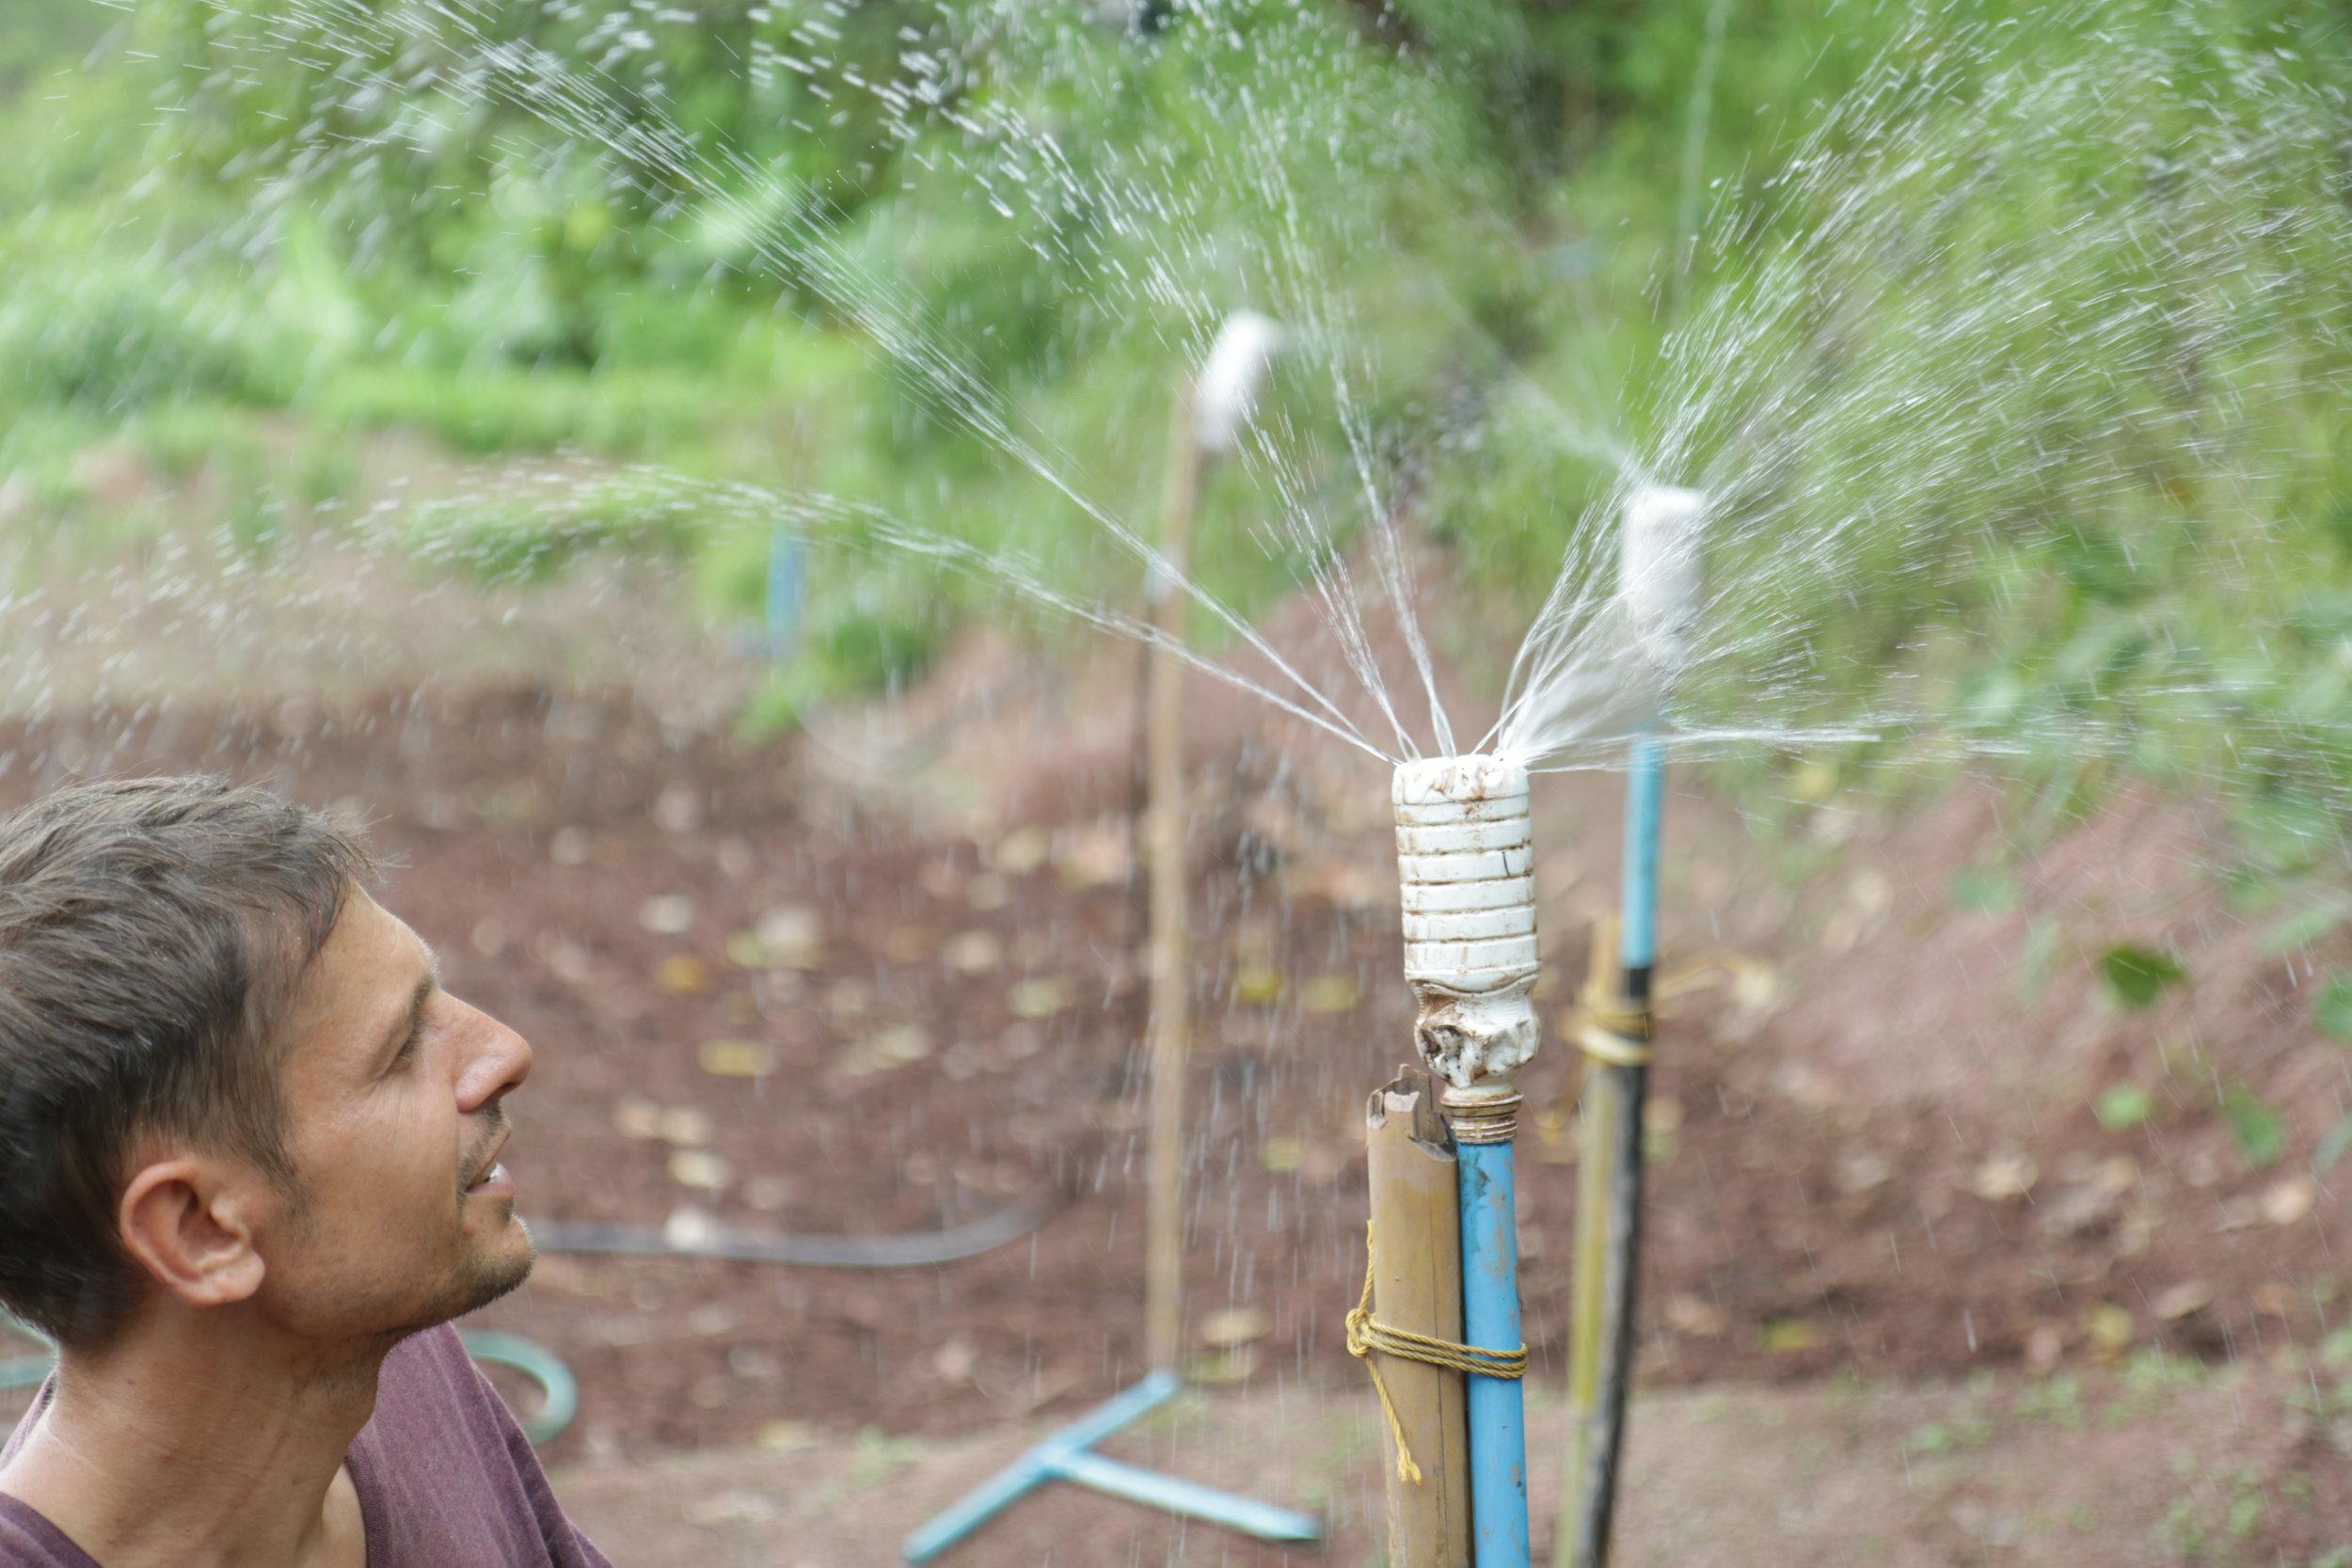 DIY water sprinkle for gardens